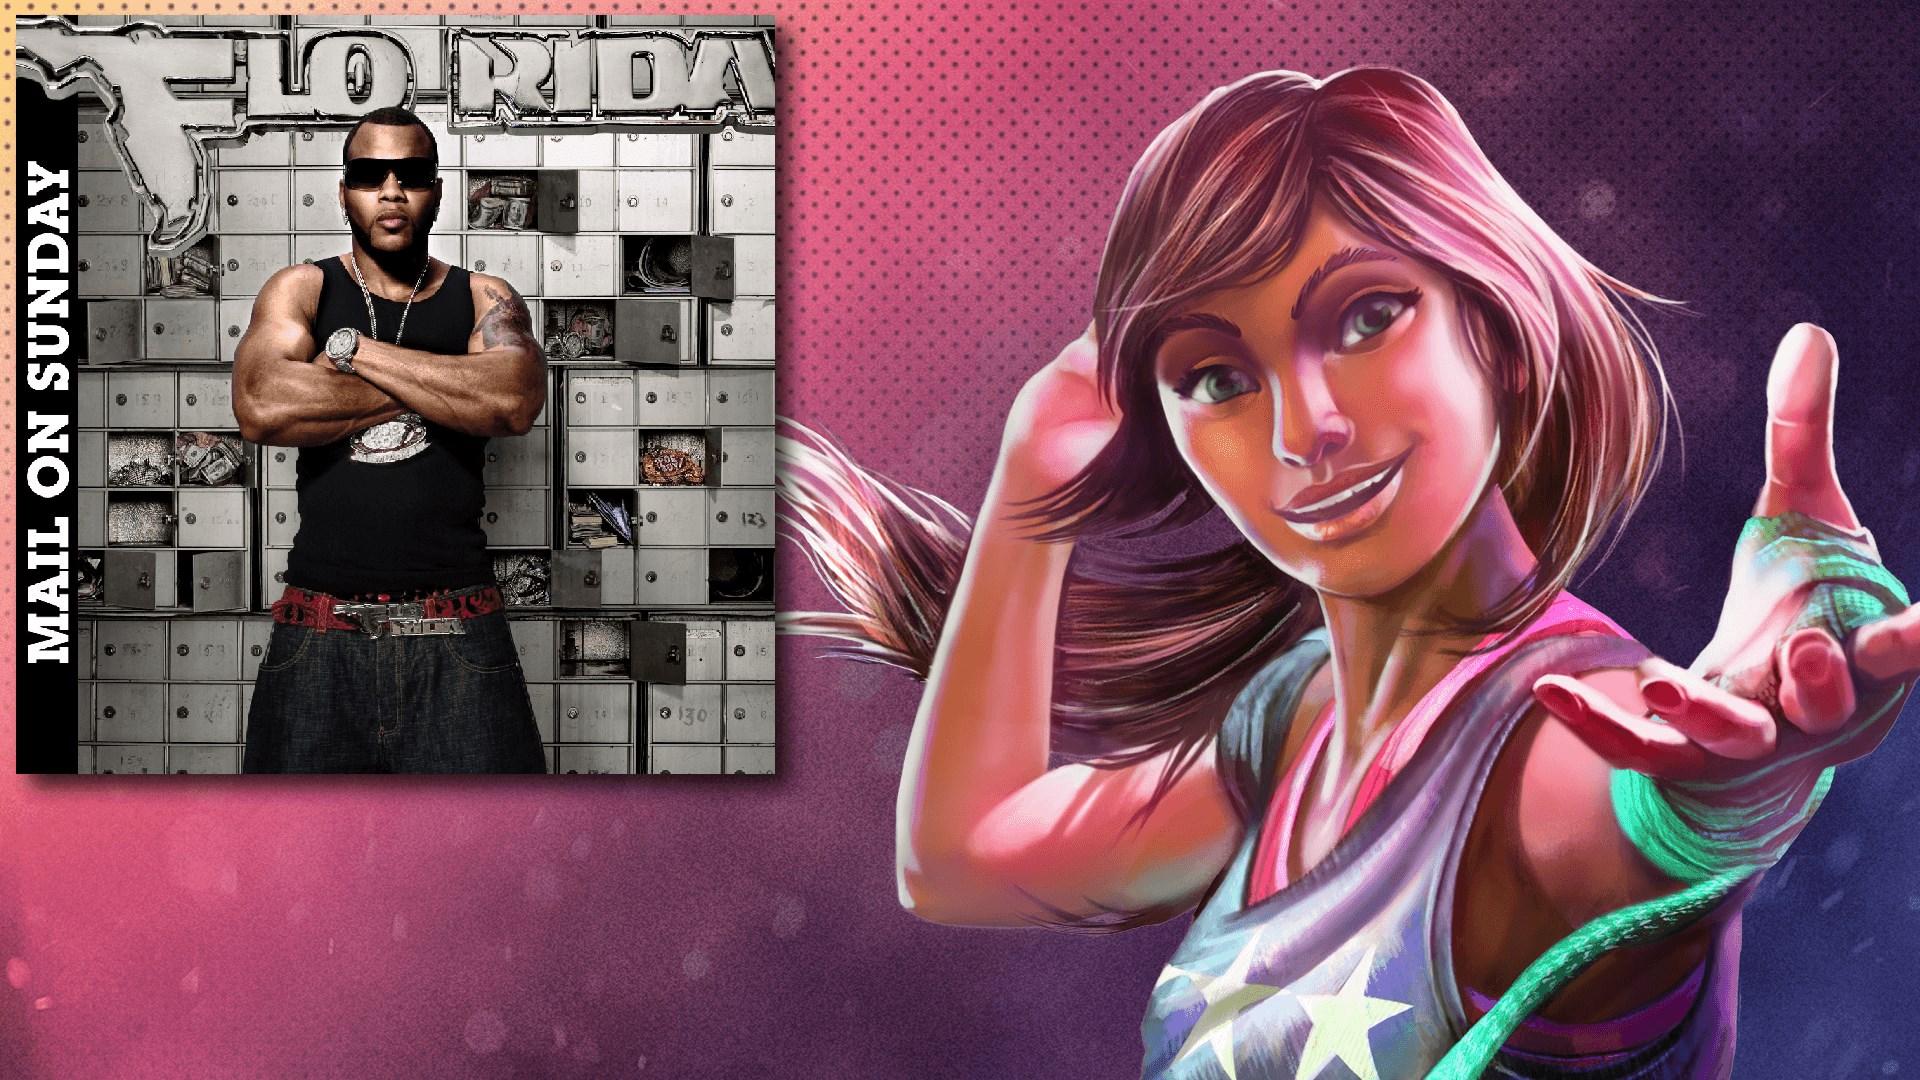 """Low"" - Flo Rida"